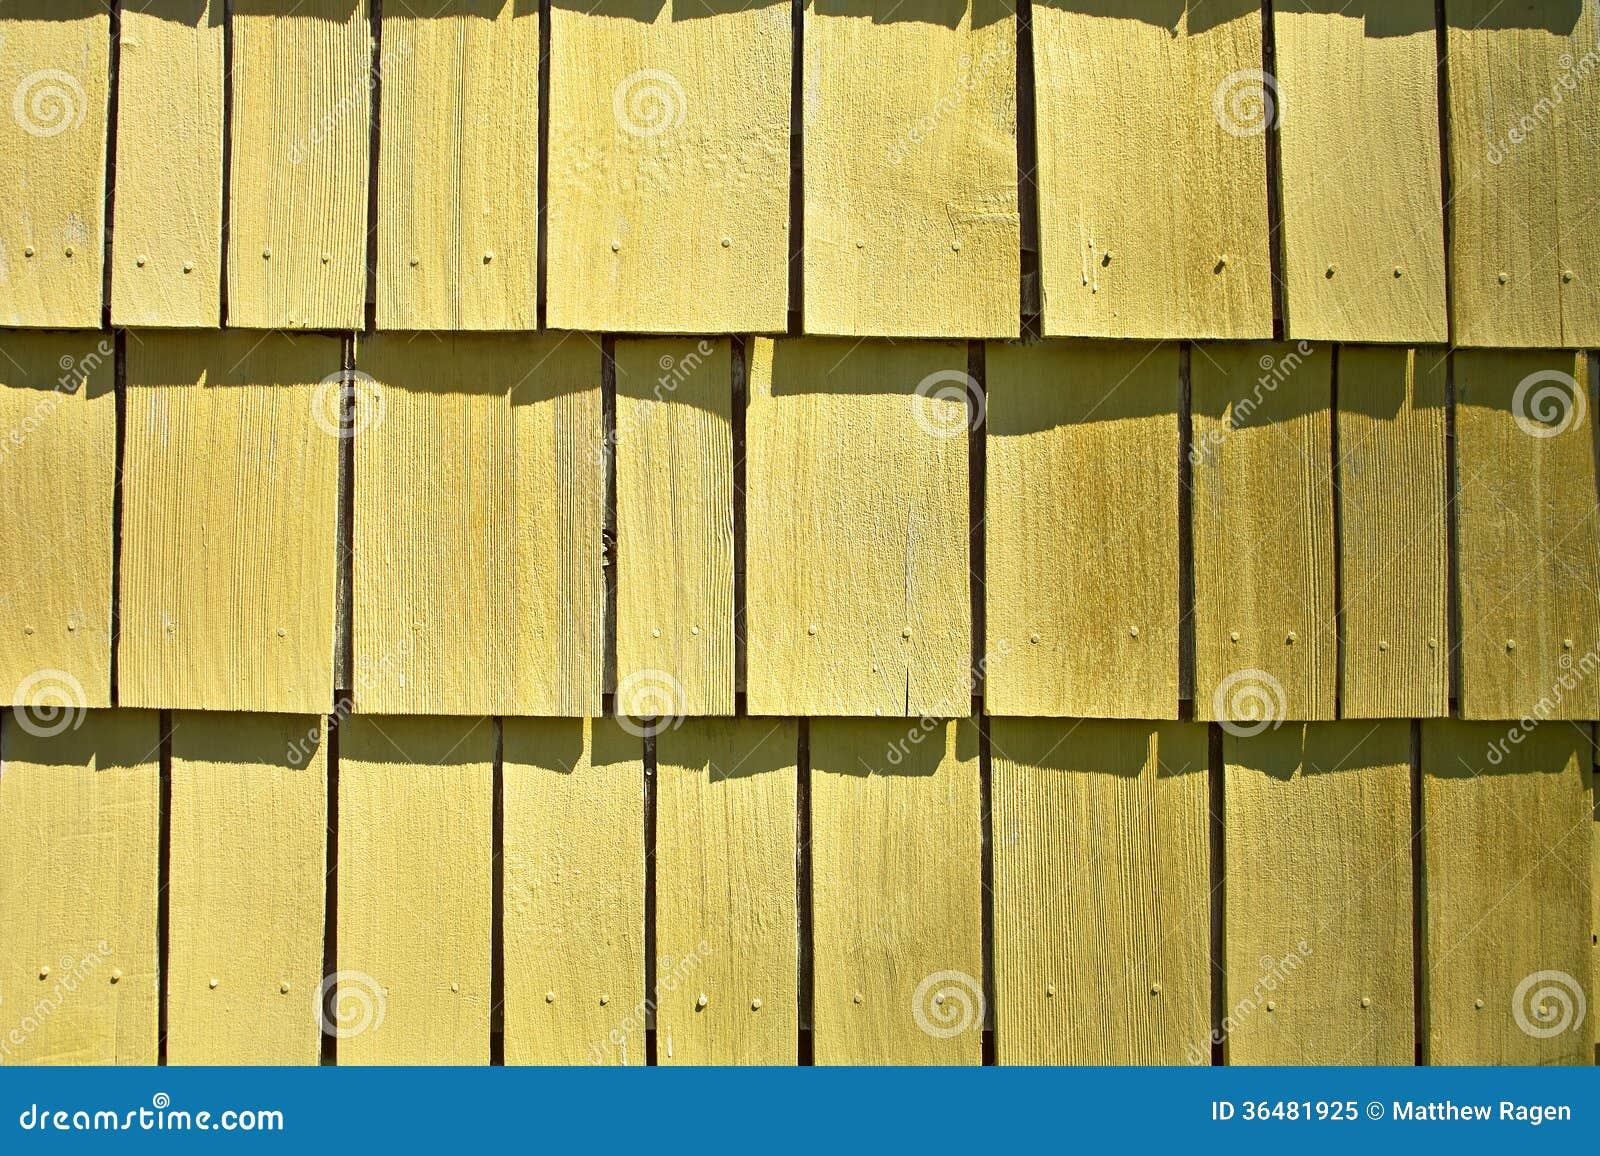 Exterior Wall Shingles : Yellow shingle pattern royalty free stock photo image